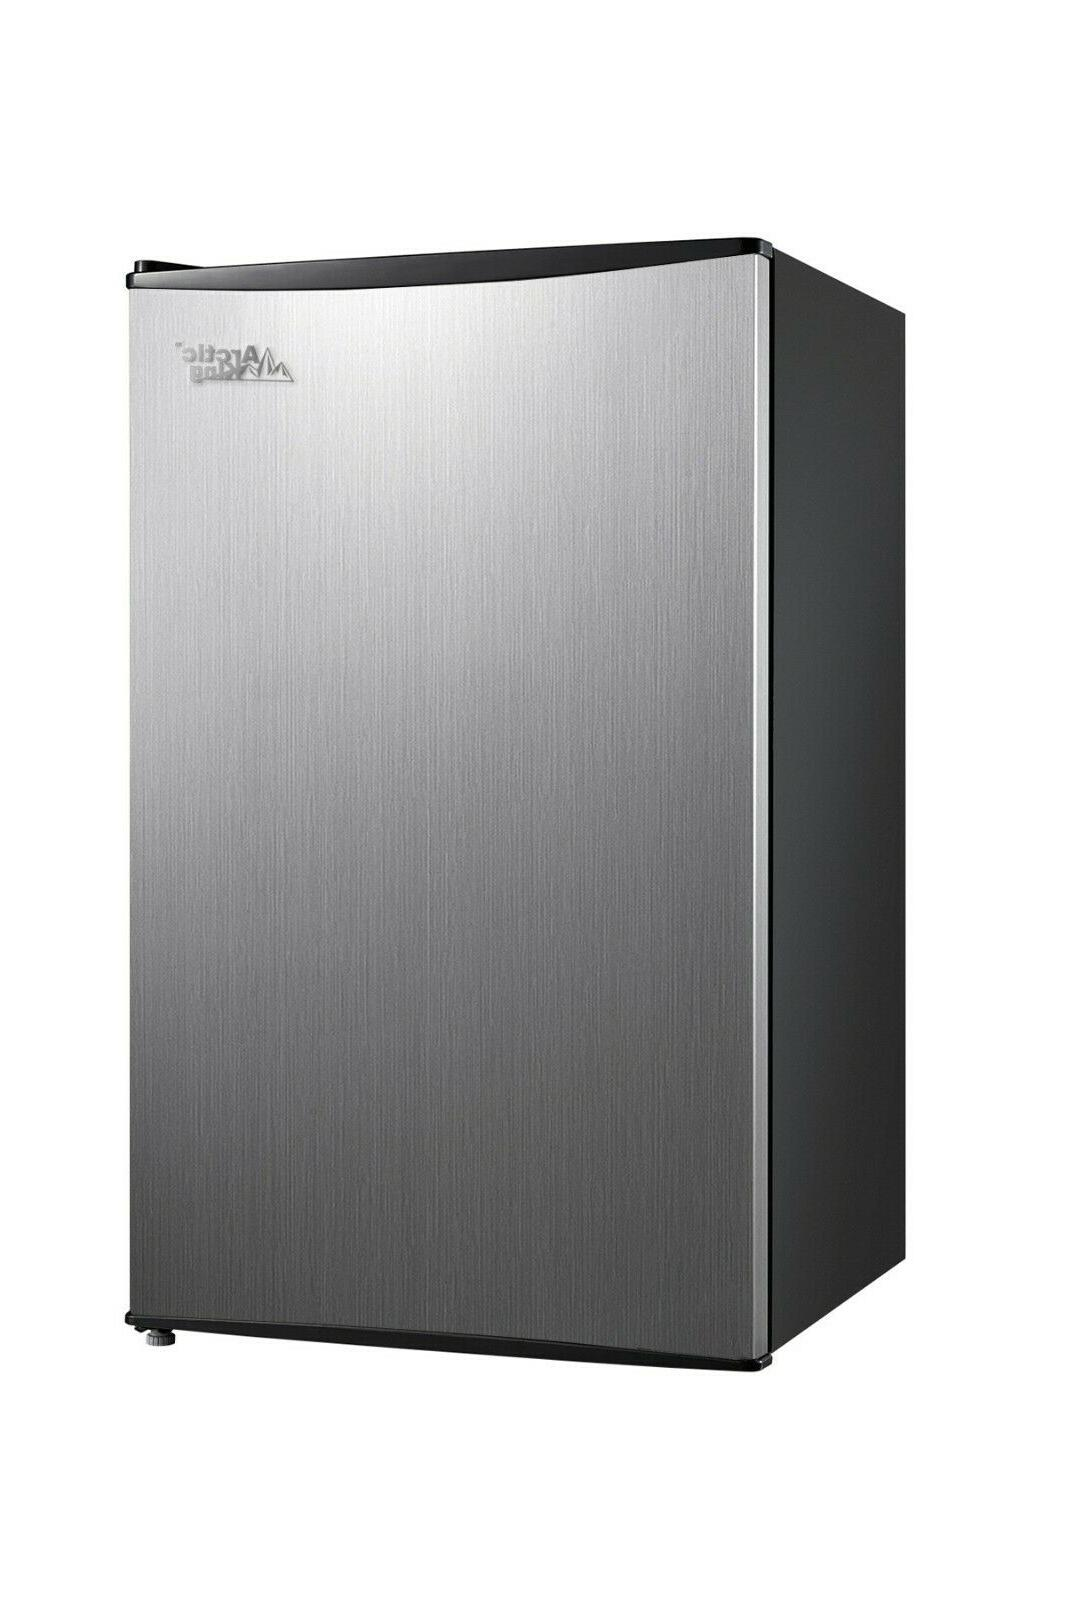 mini fridge small compact refrigerator single door